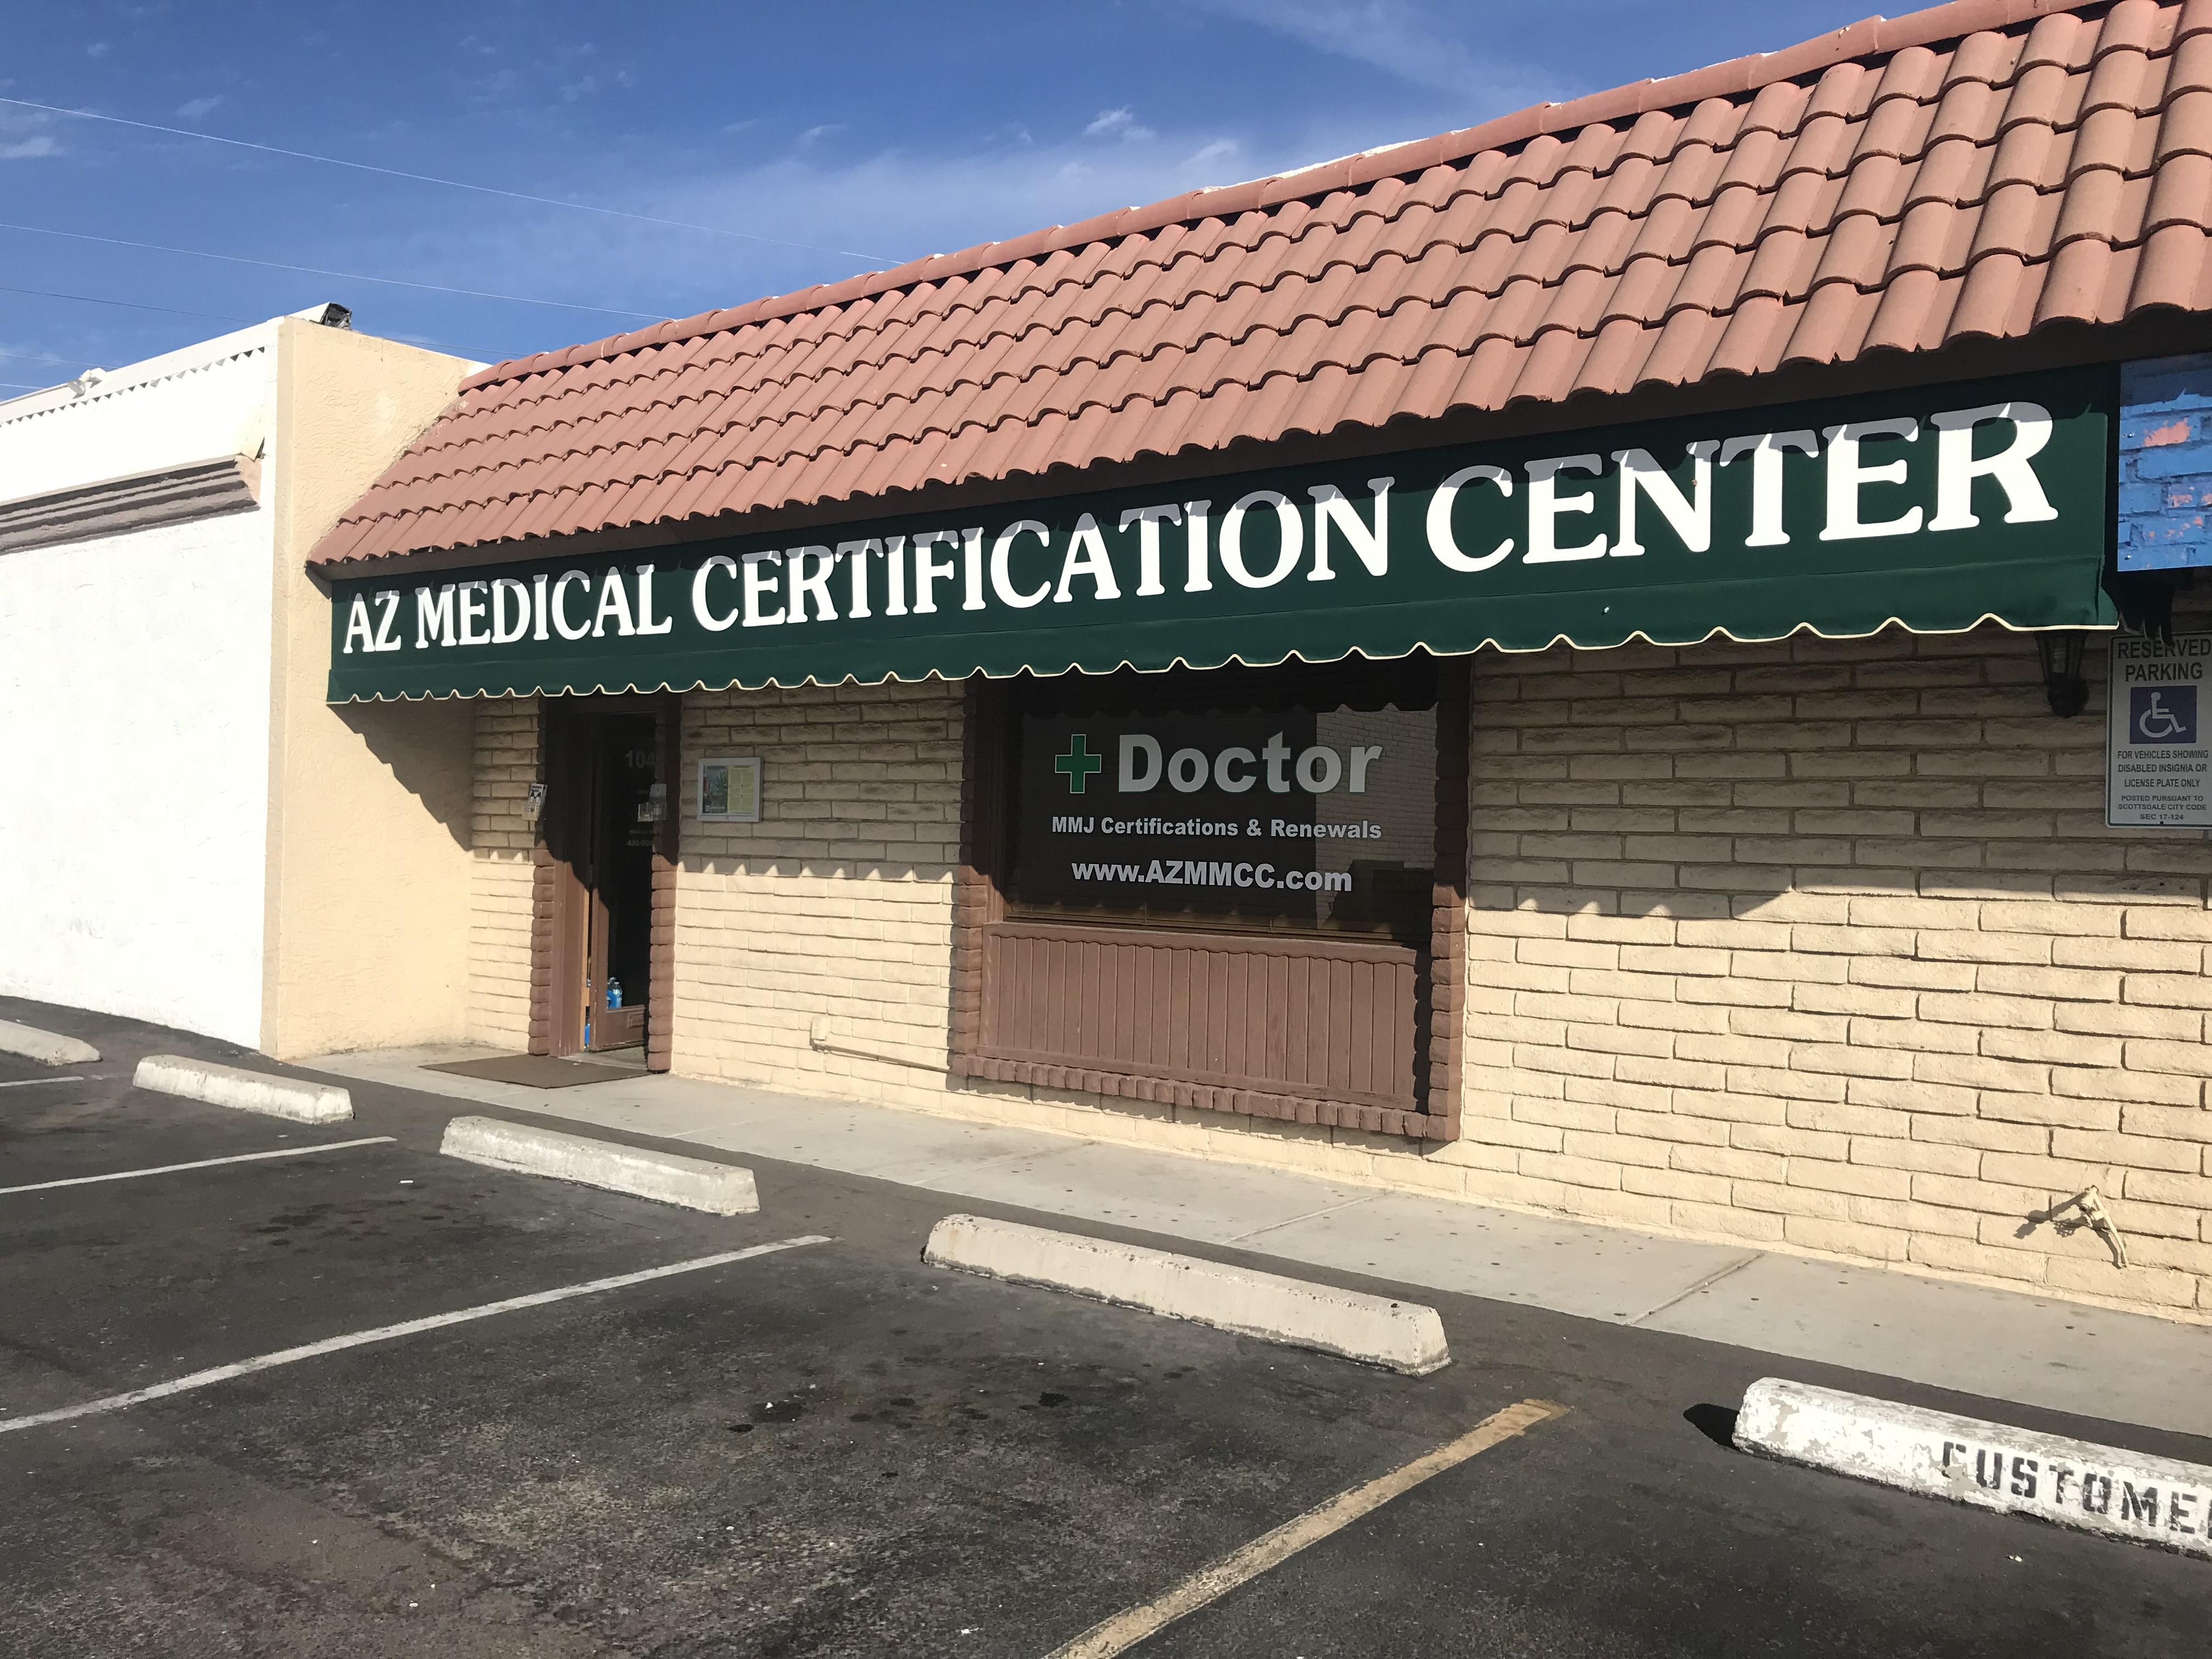 Arizonas medical marijuana business arizona news arizona medical marijuana certification center opened its doors in december 2010 and now has nine locations 1betcityfo Gallery